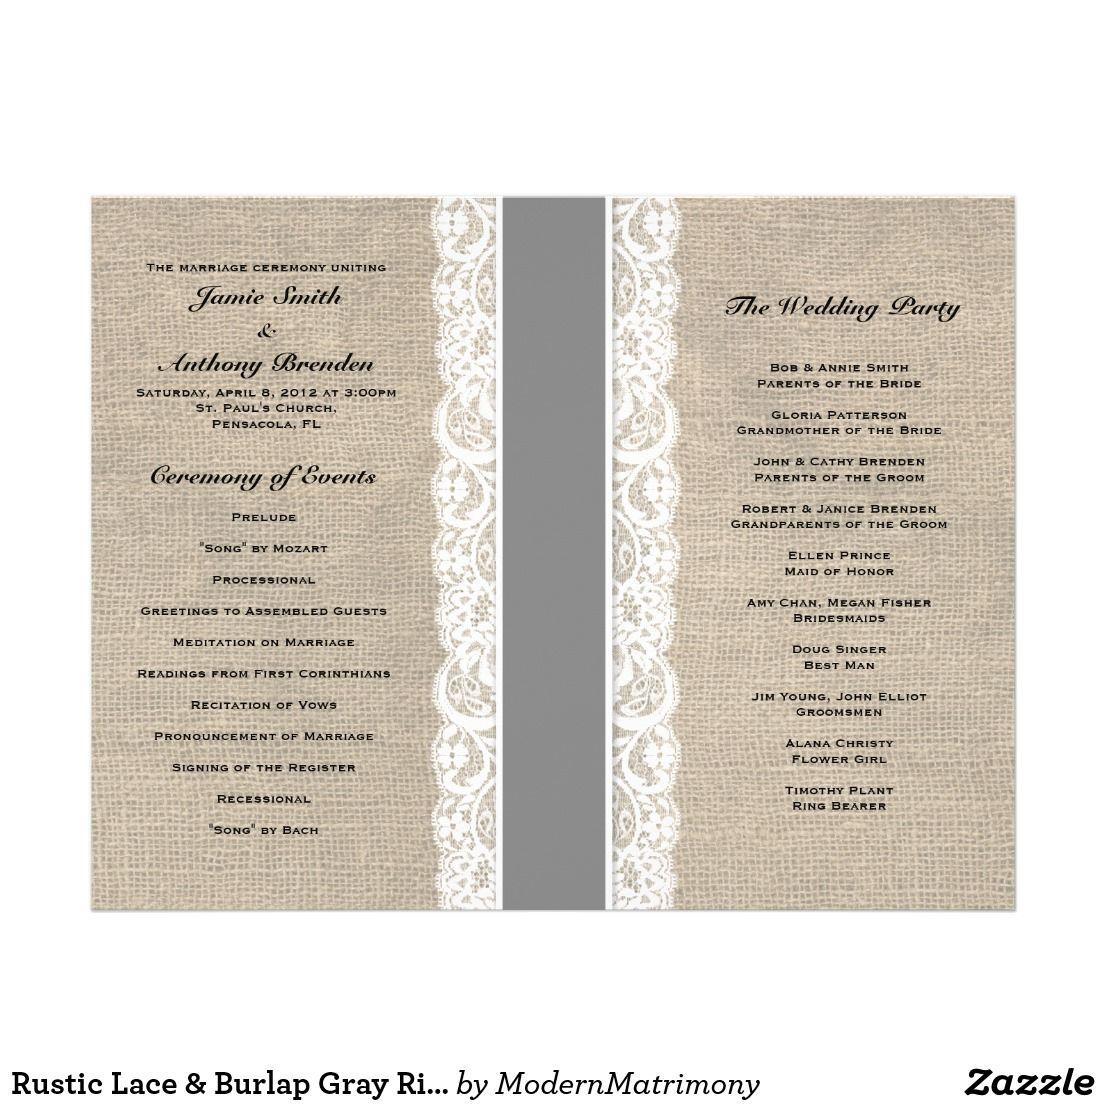 Rustic Lace & Burlap Gray Ribbon Wedding Program